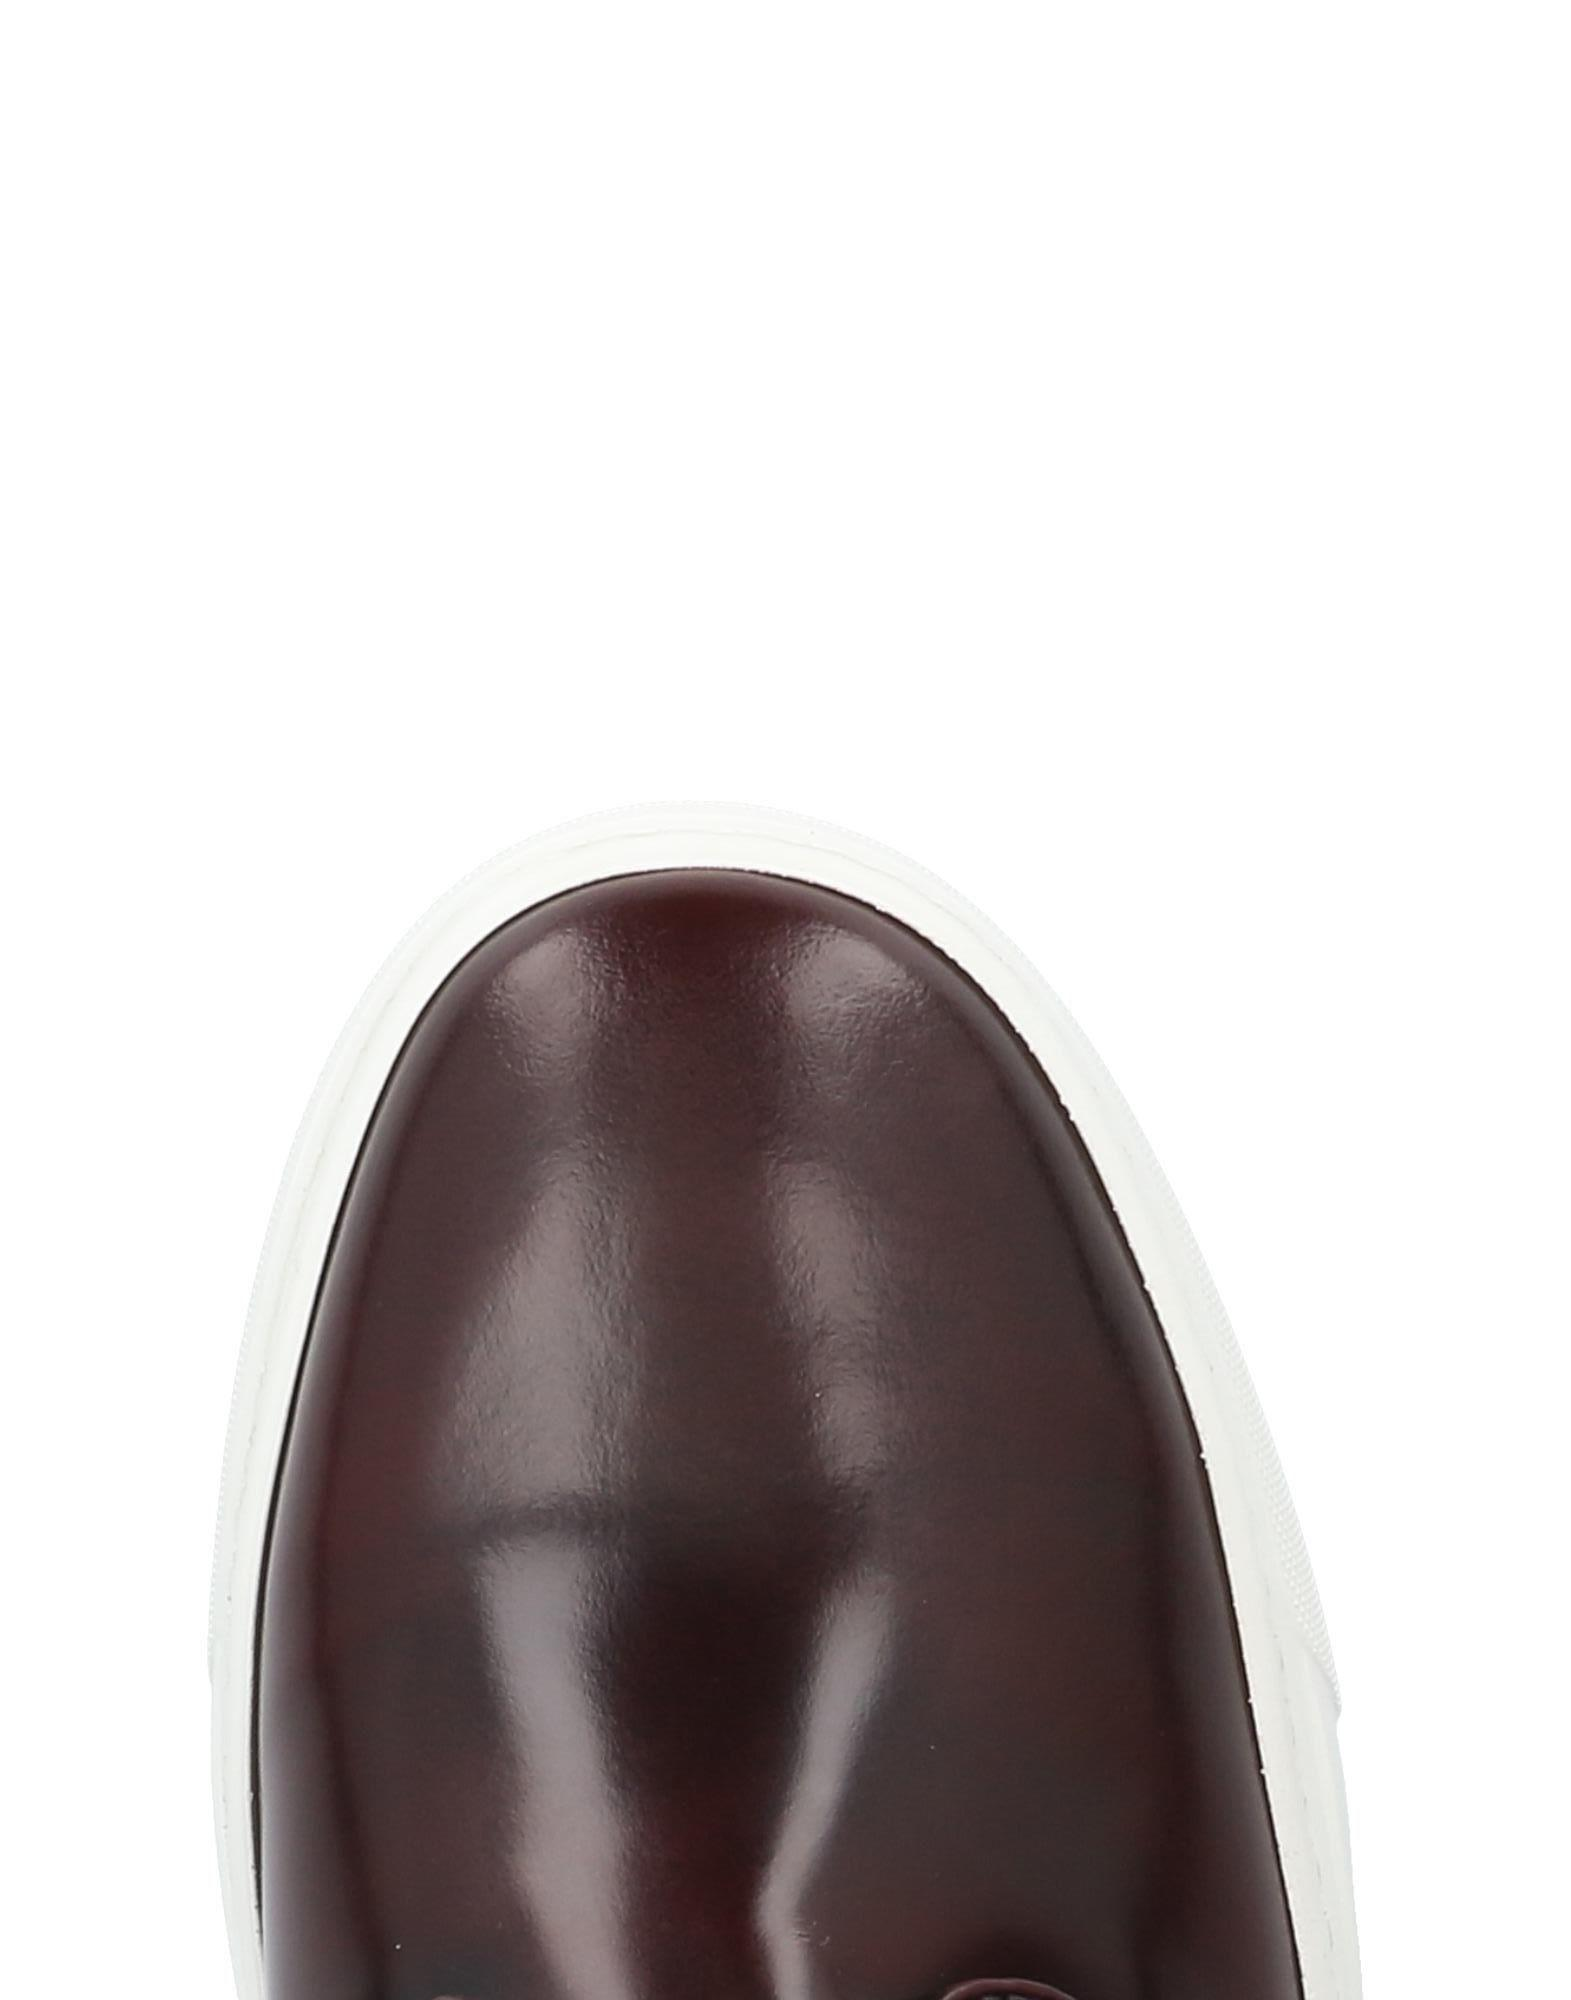 Gianfranco Lattanzi Leather Low-tops & Sneakers in Cocoa (Brown)